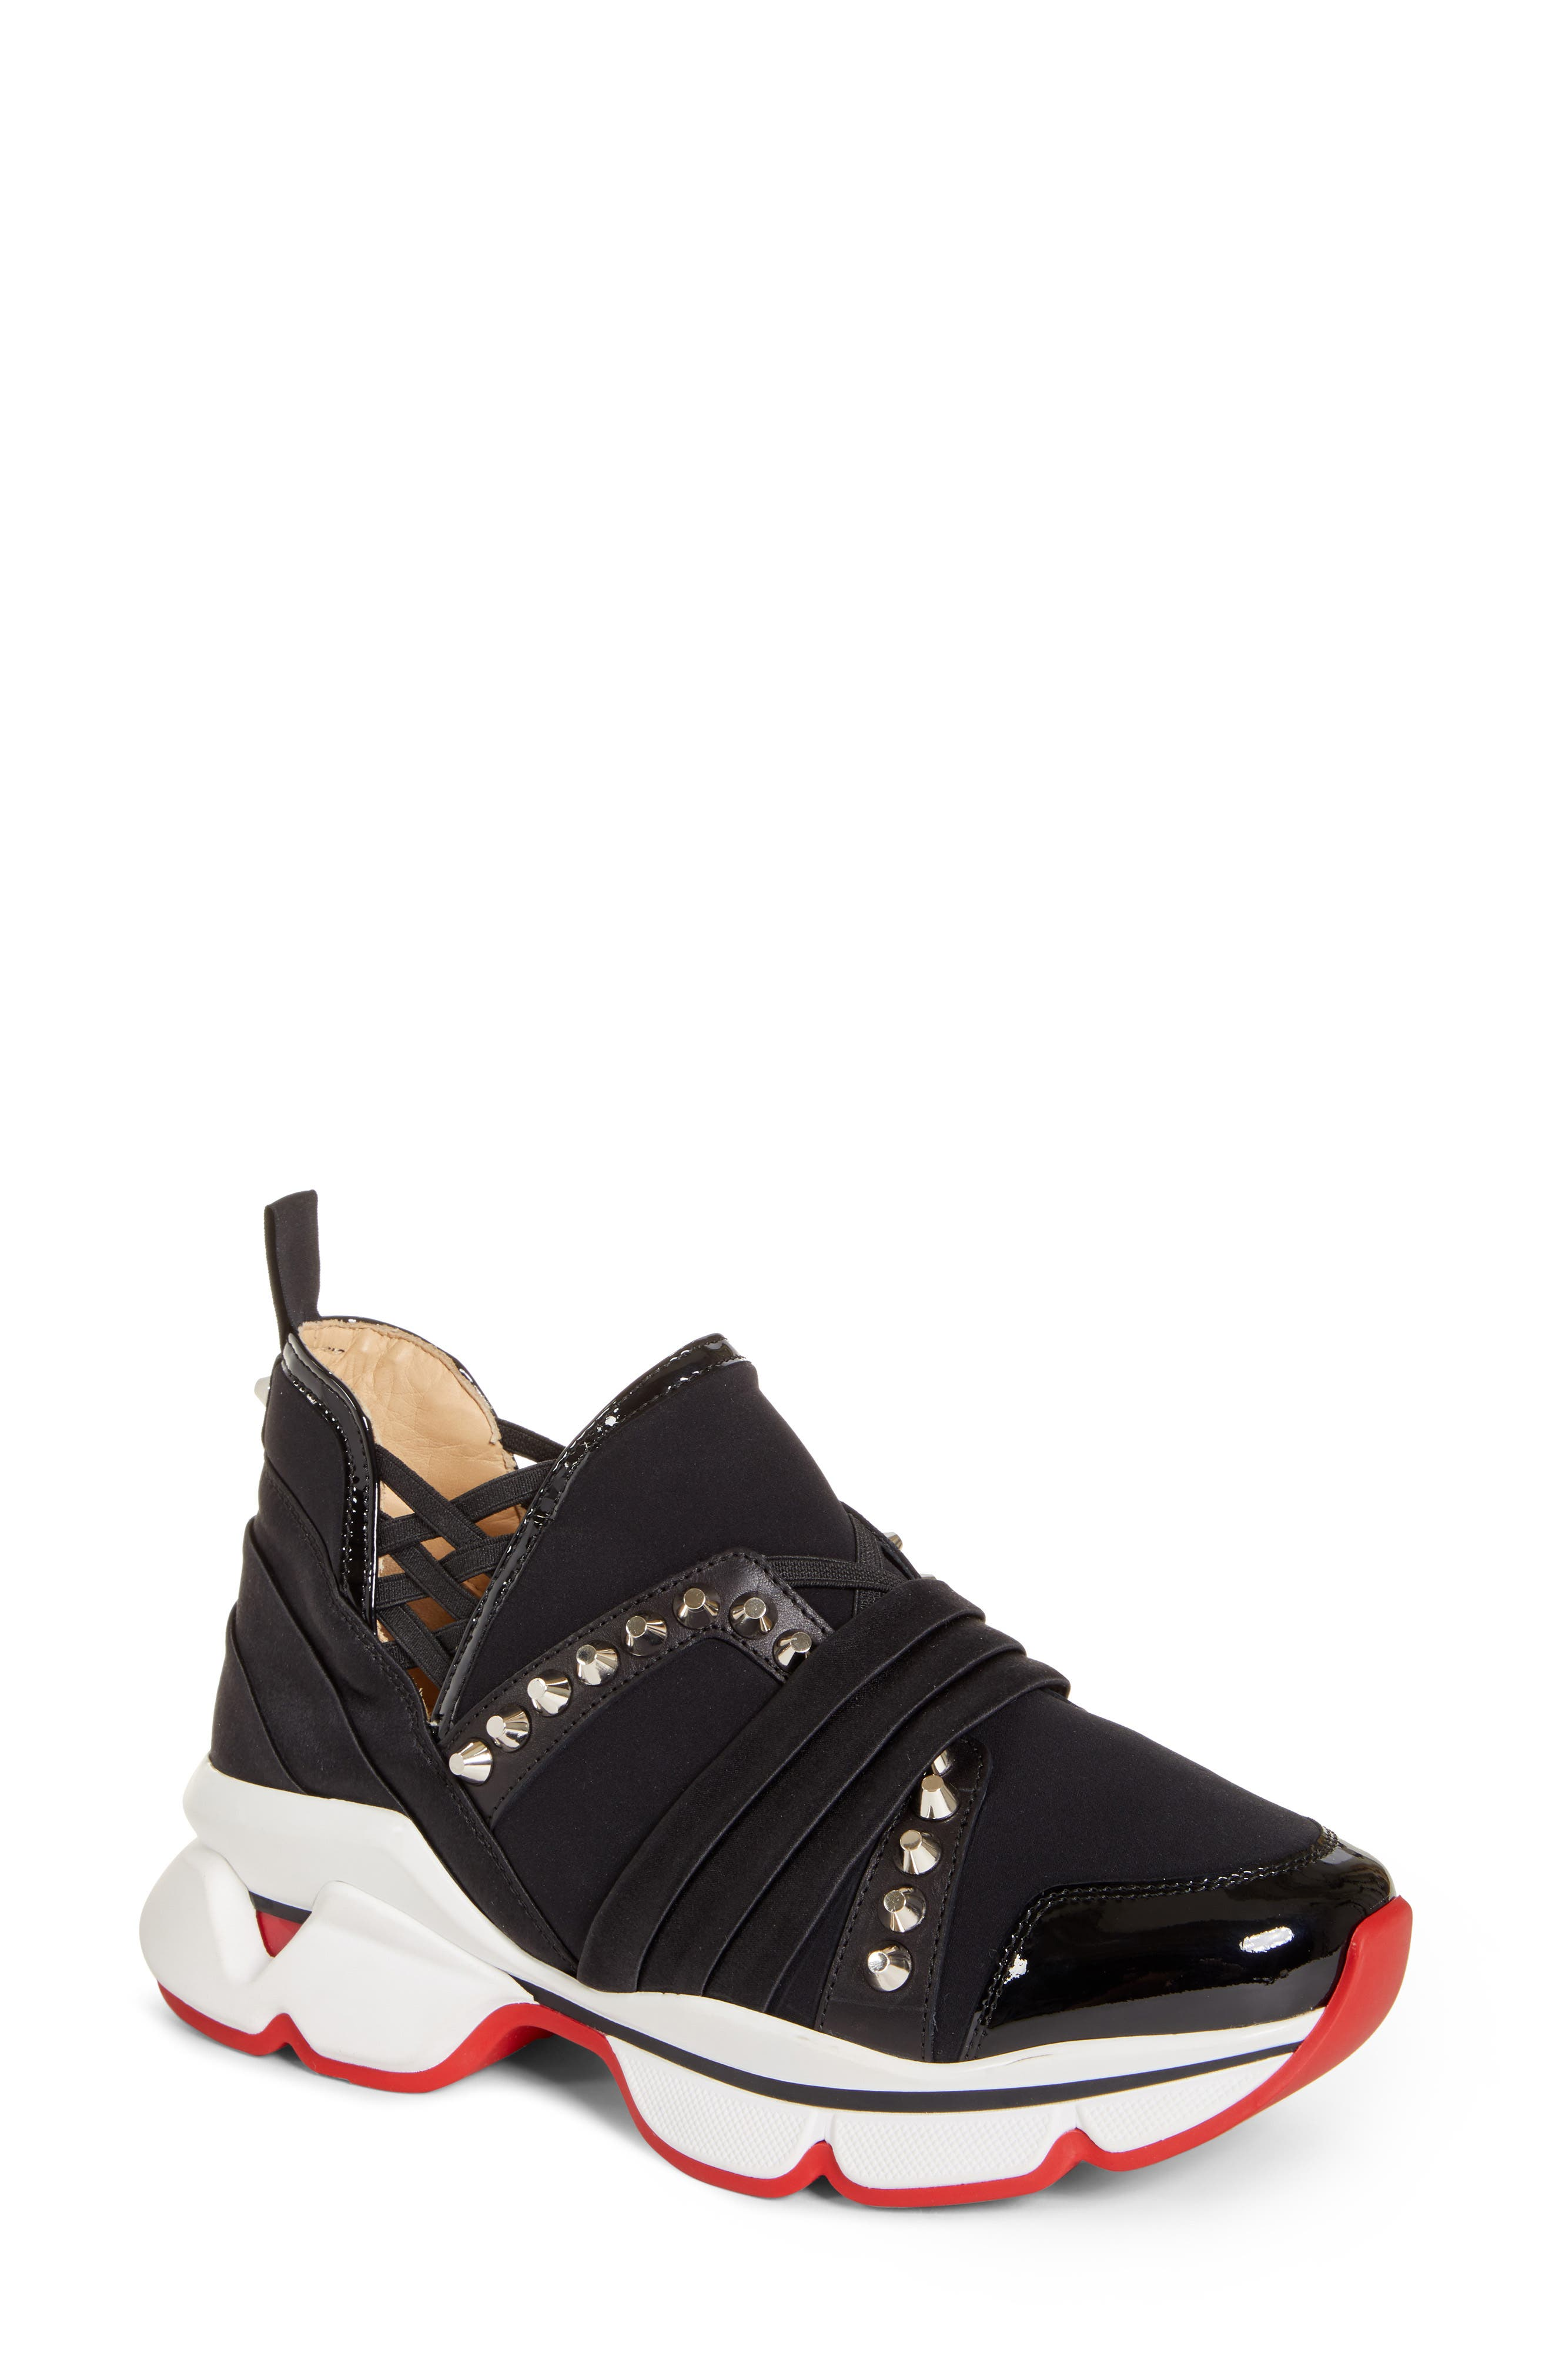 CHRISTIAN LOUBOUTIN Run Slip-On Sneaker, Main, color, BLACK